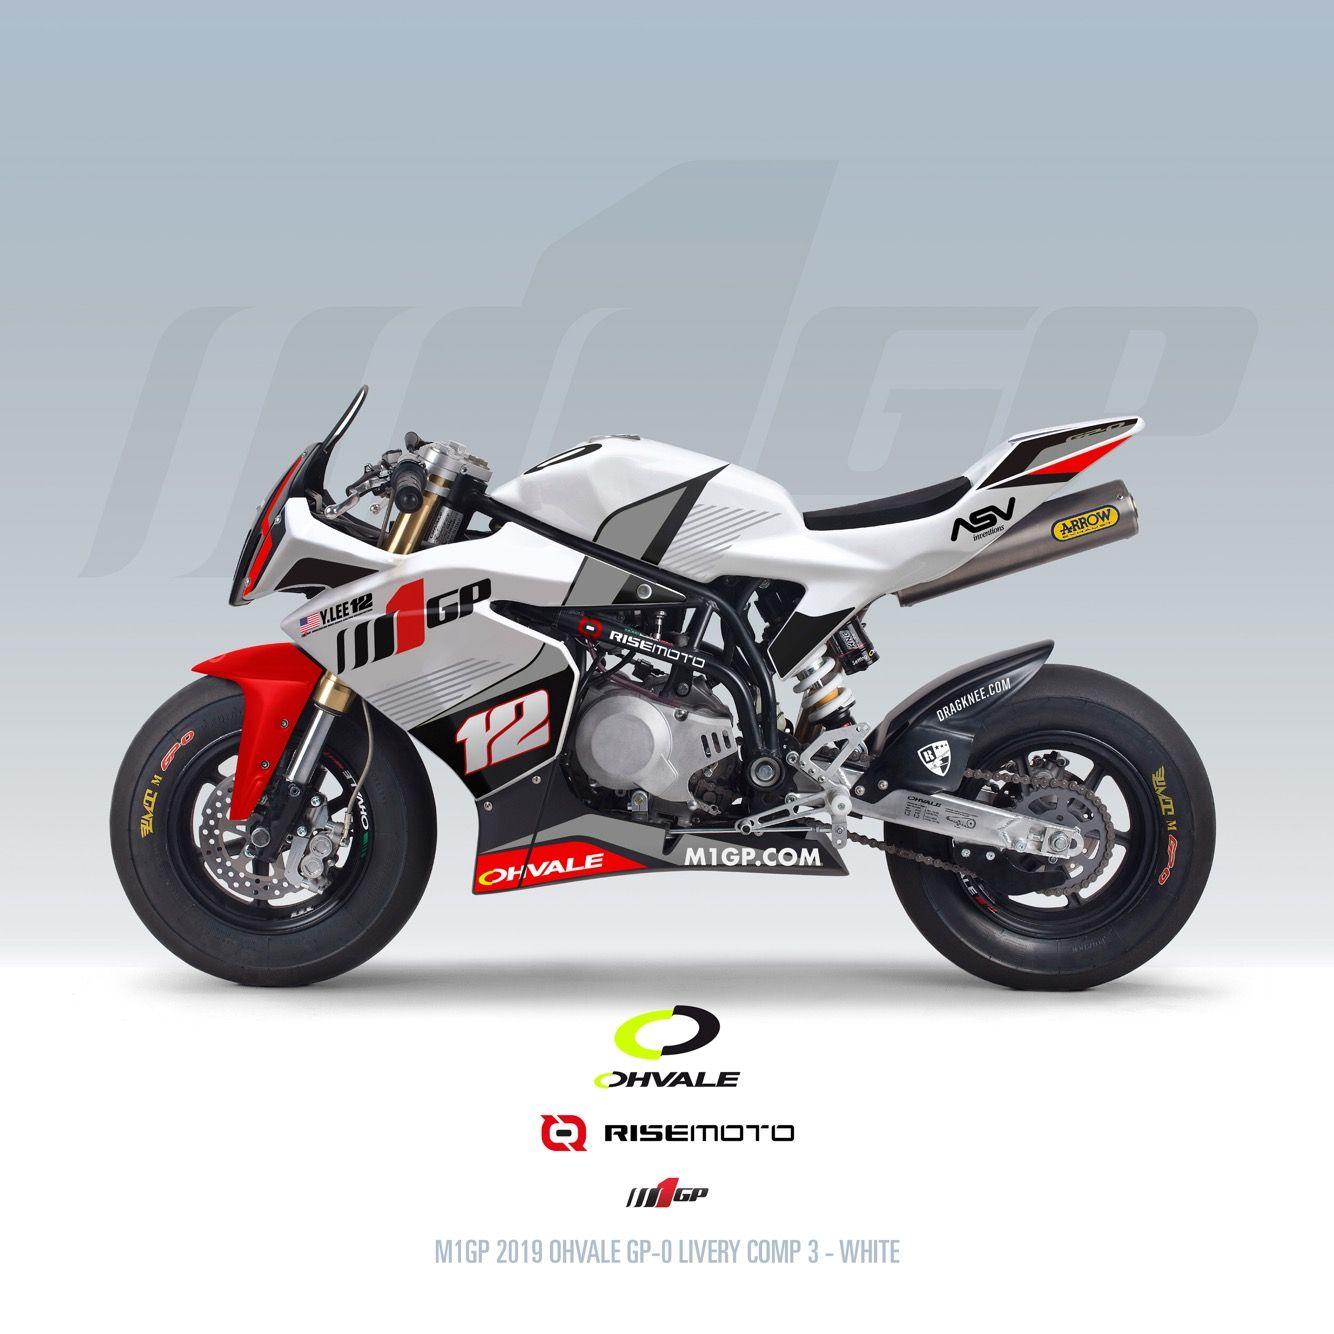 Ohvale GP0 M1GP m1gp Motorcycle racing minimoto